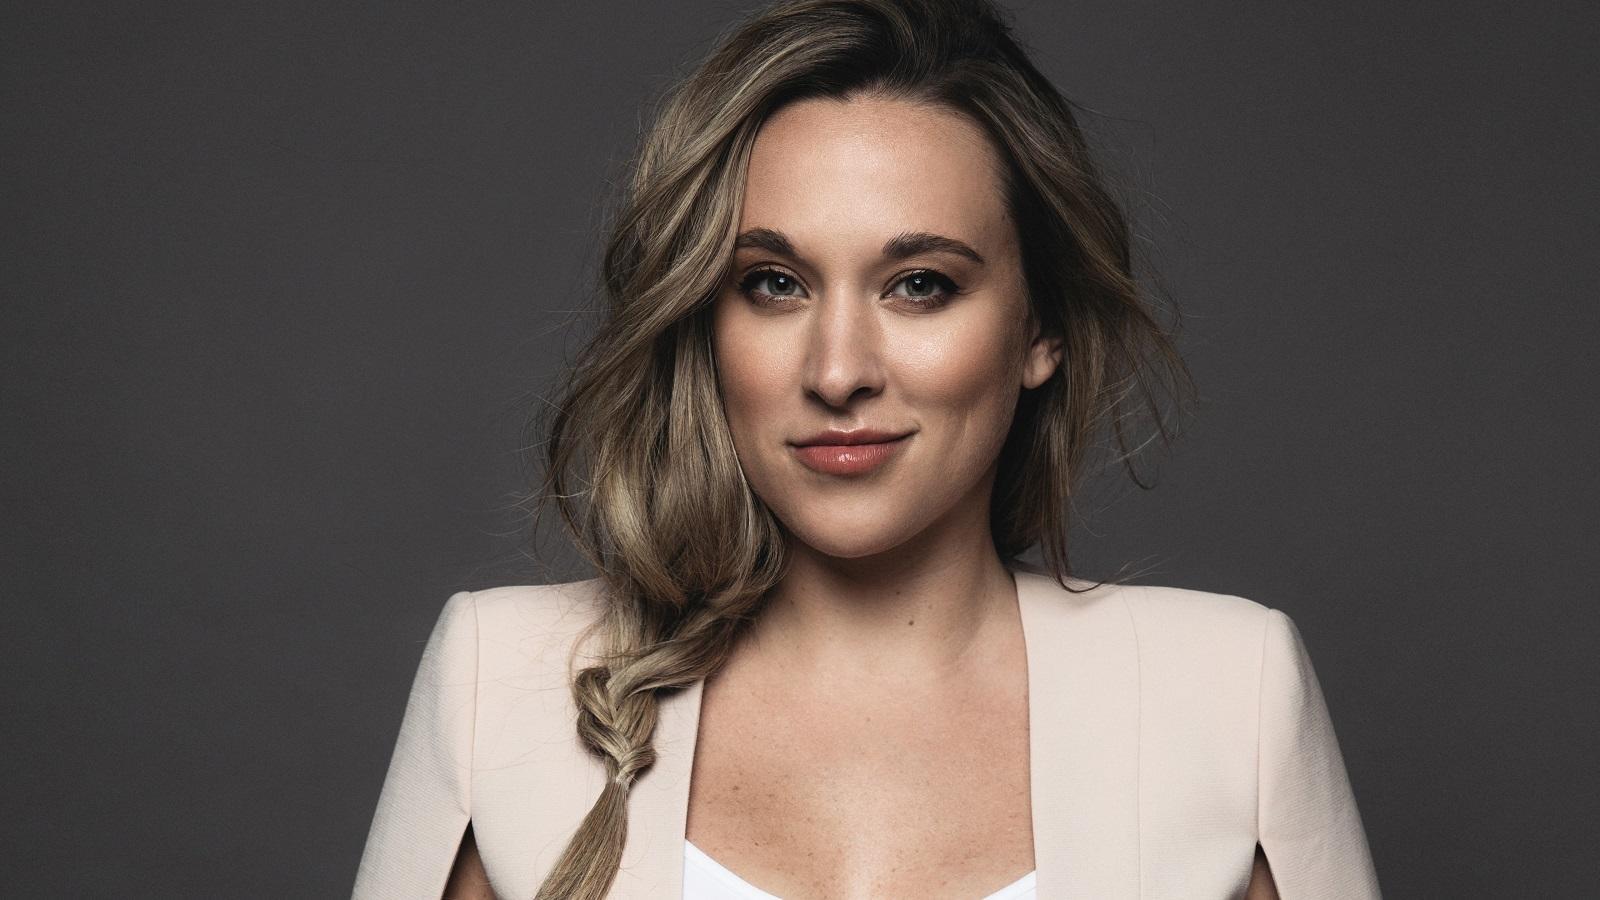 Crime Junkie podcast host Ashley Flowers